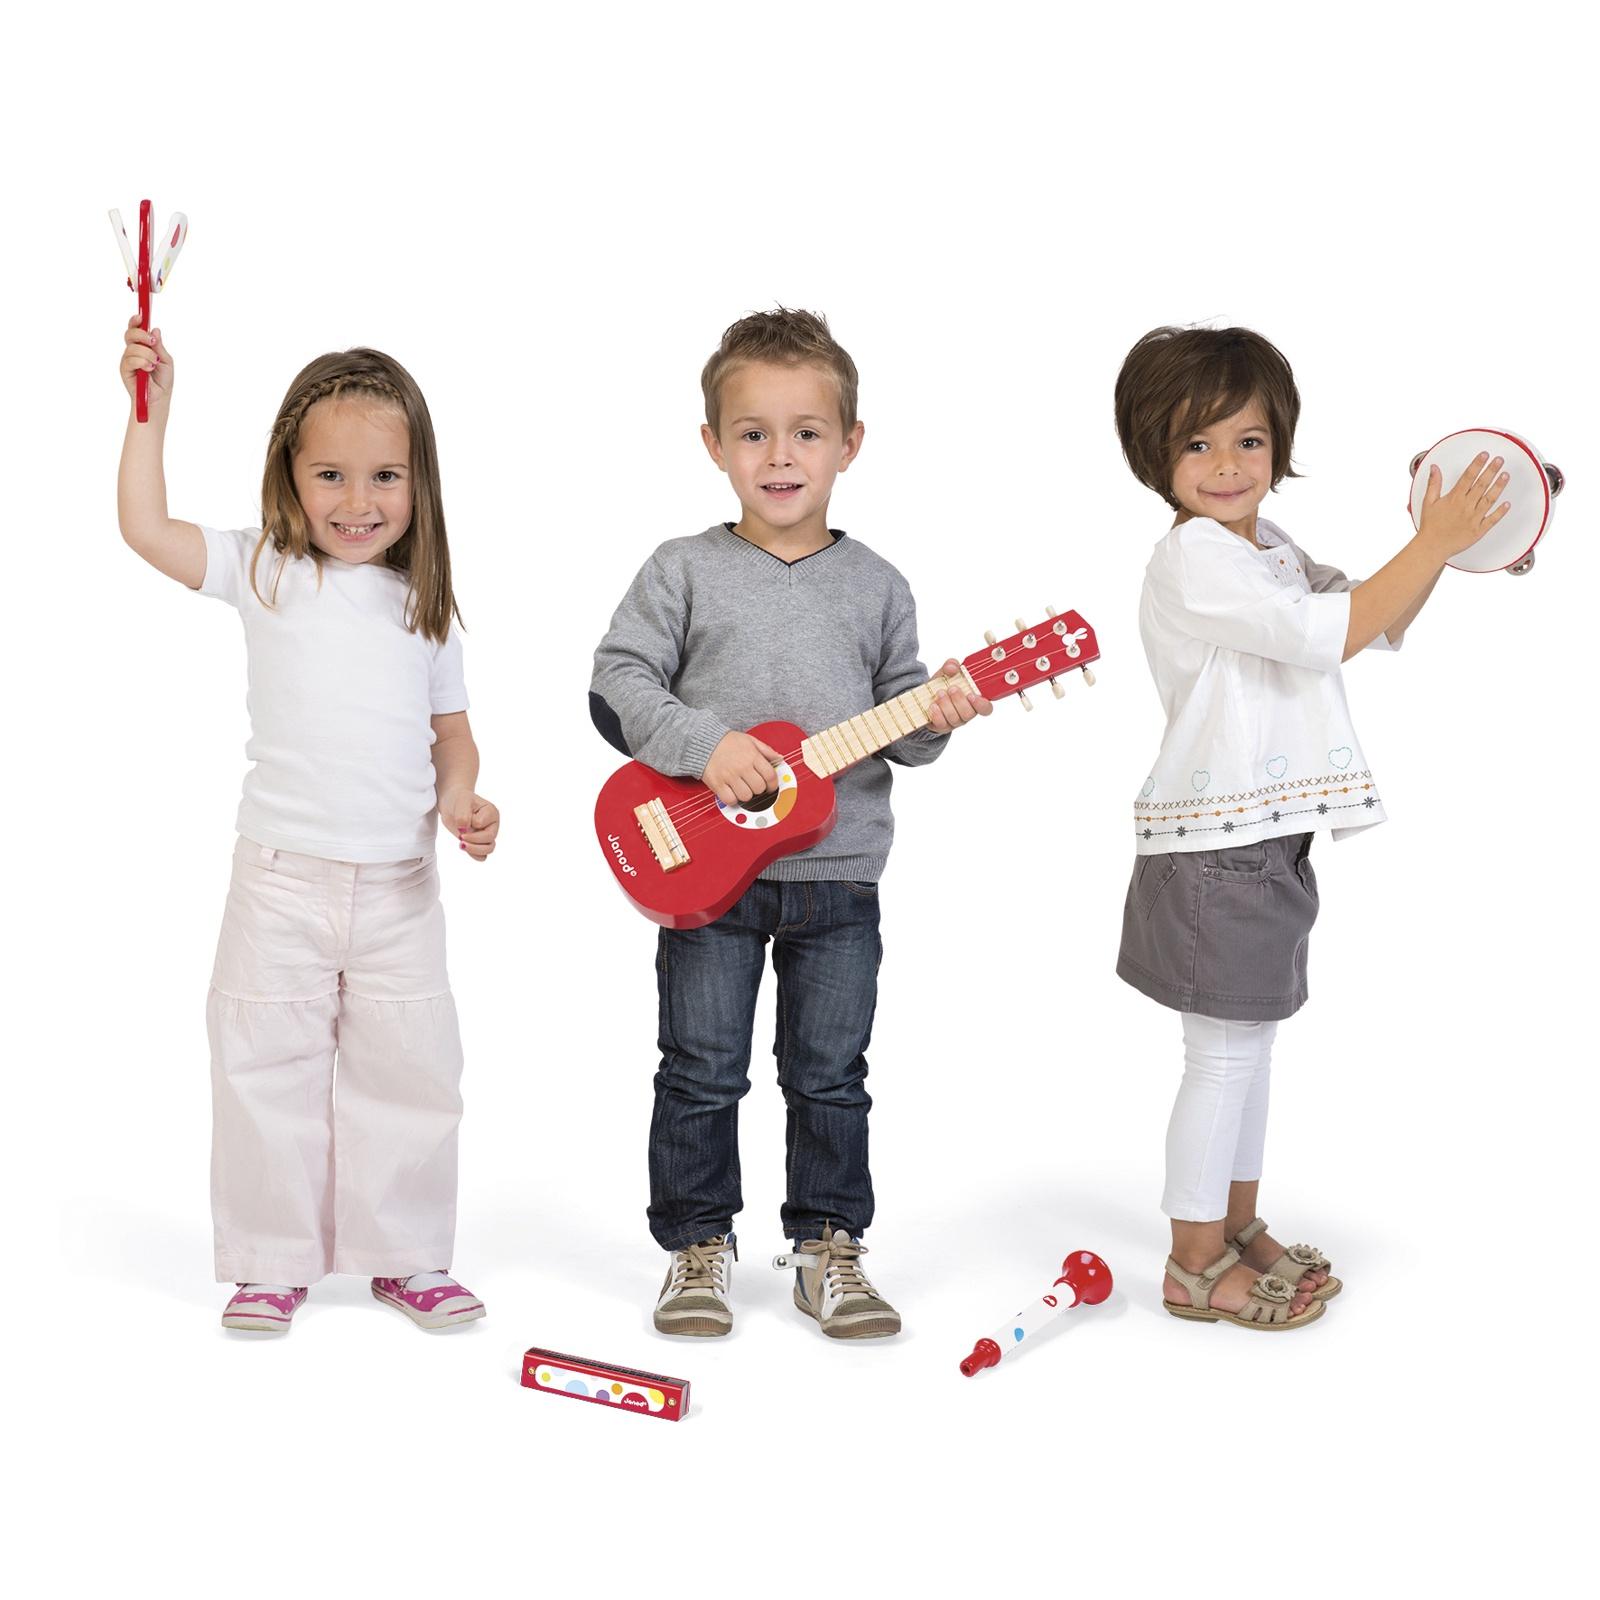 Комплект детски музикални инструменти Конфети от Janod- китара,кречетало, дайре, хармоника и тромпет(1)-bellamiestore